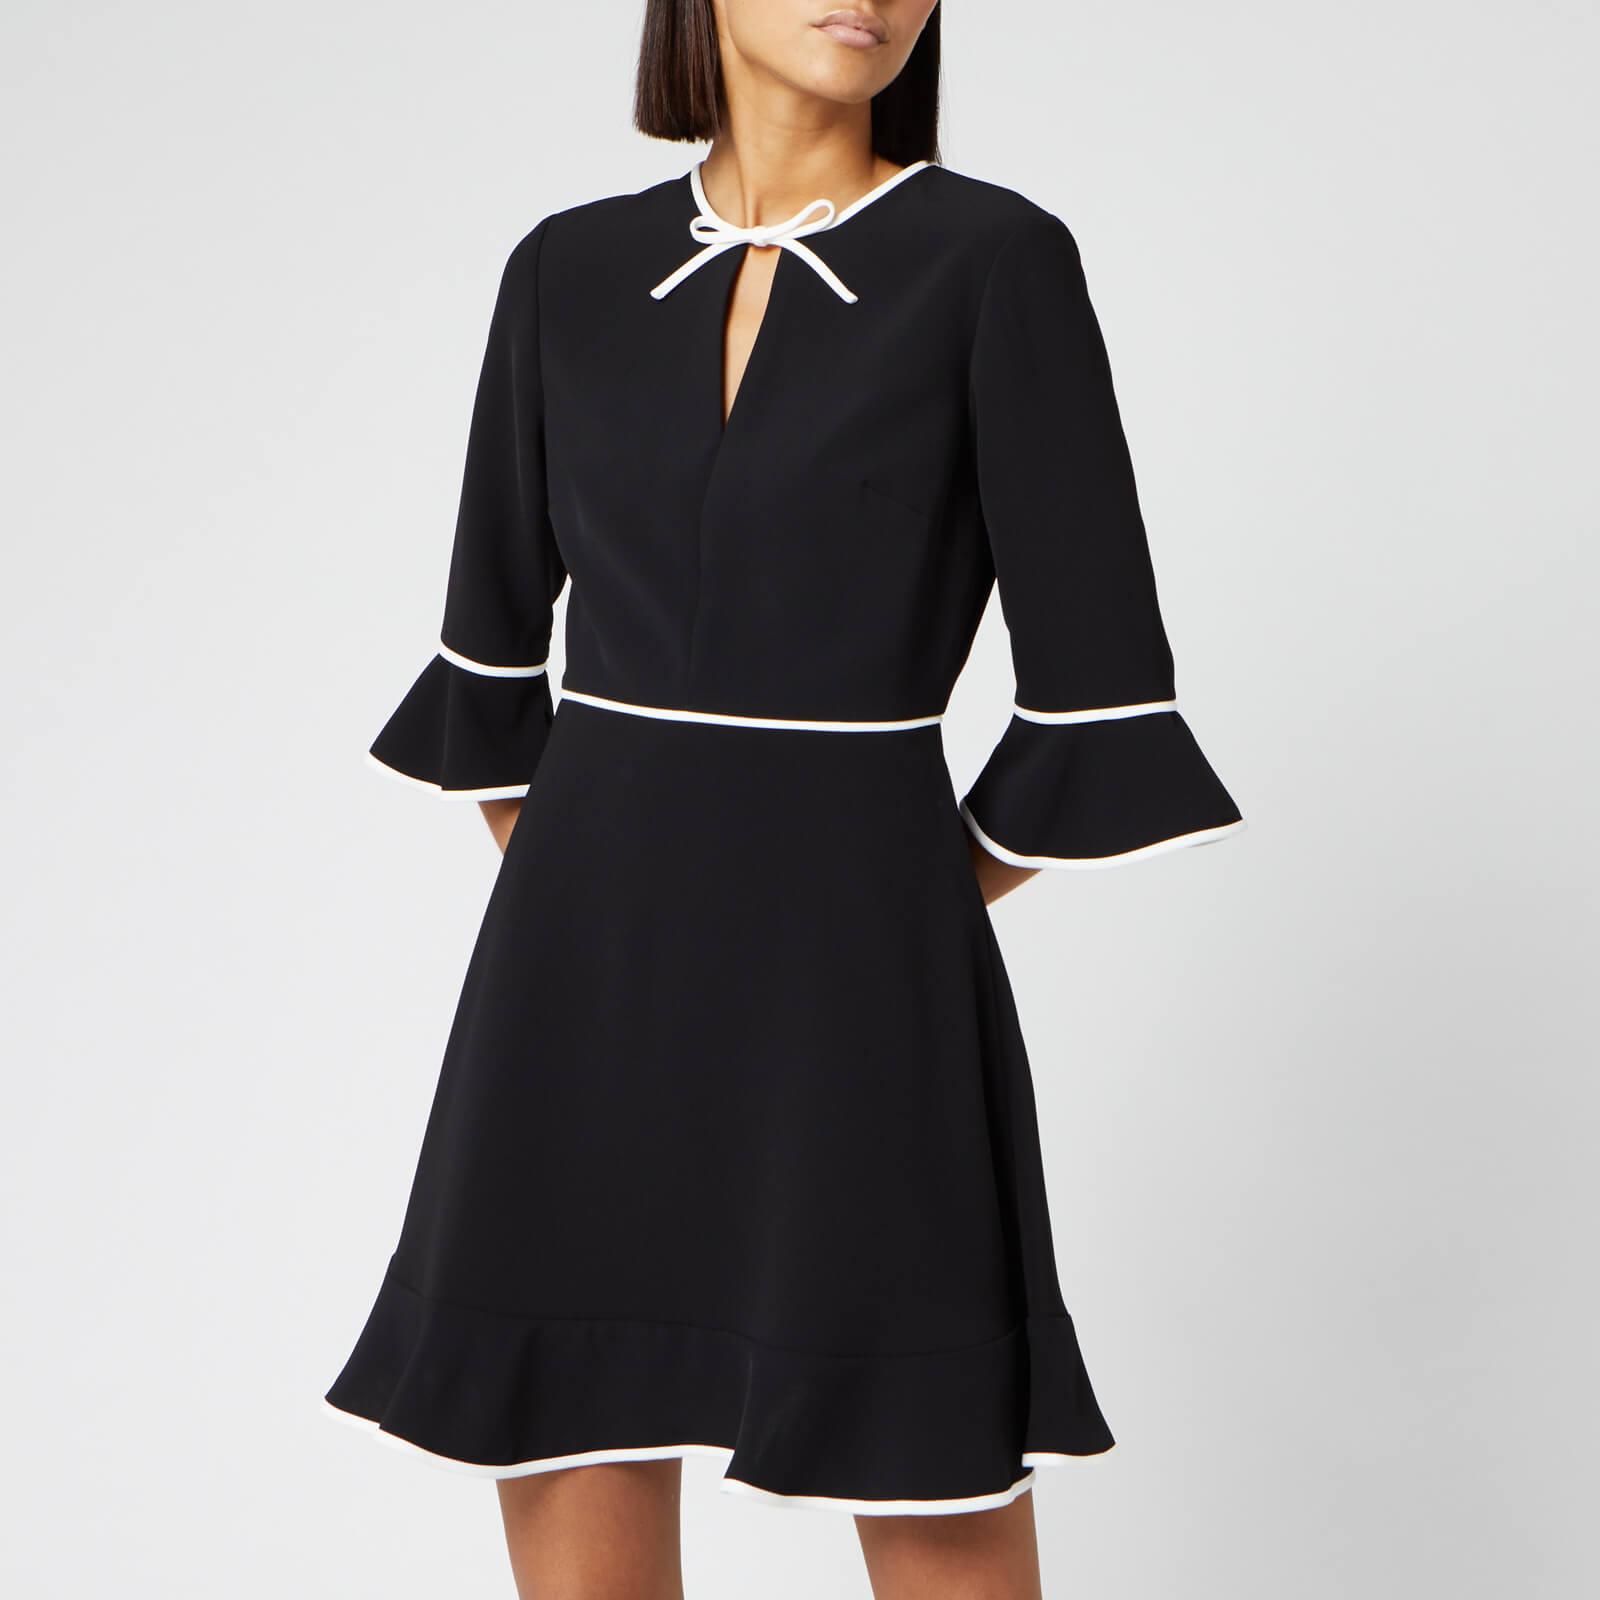 Ted Baker Women's Dindy Skater Dress with Bow Binding - Black - 2/UK 10